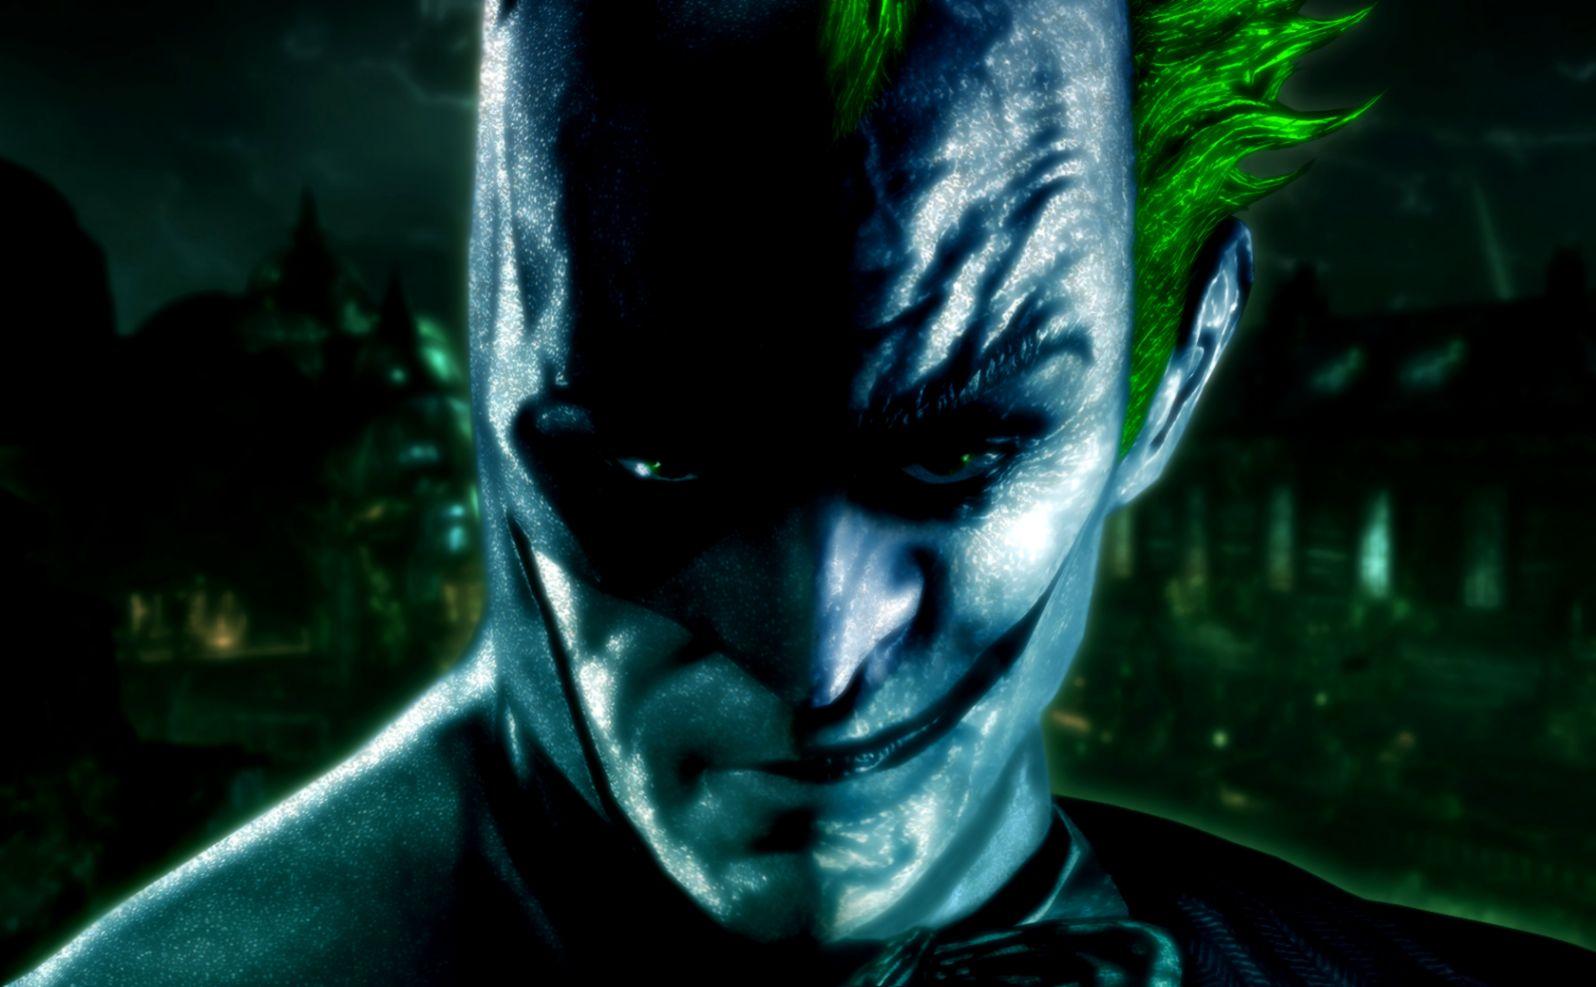 Batman Arkham Origins Vs Joker Hd Video Games Artwork